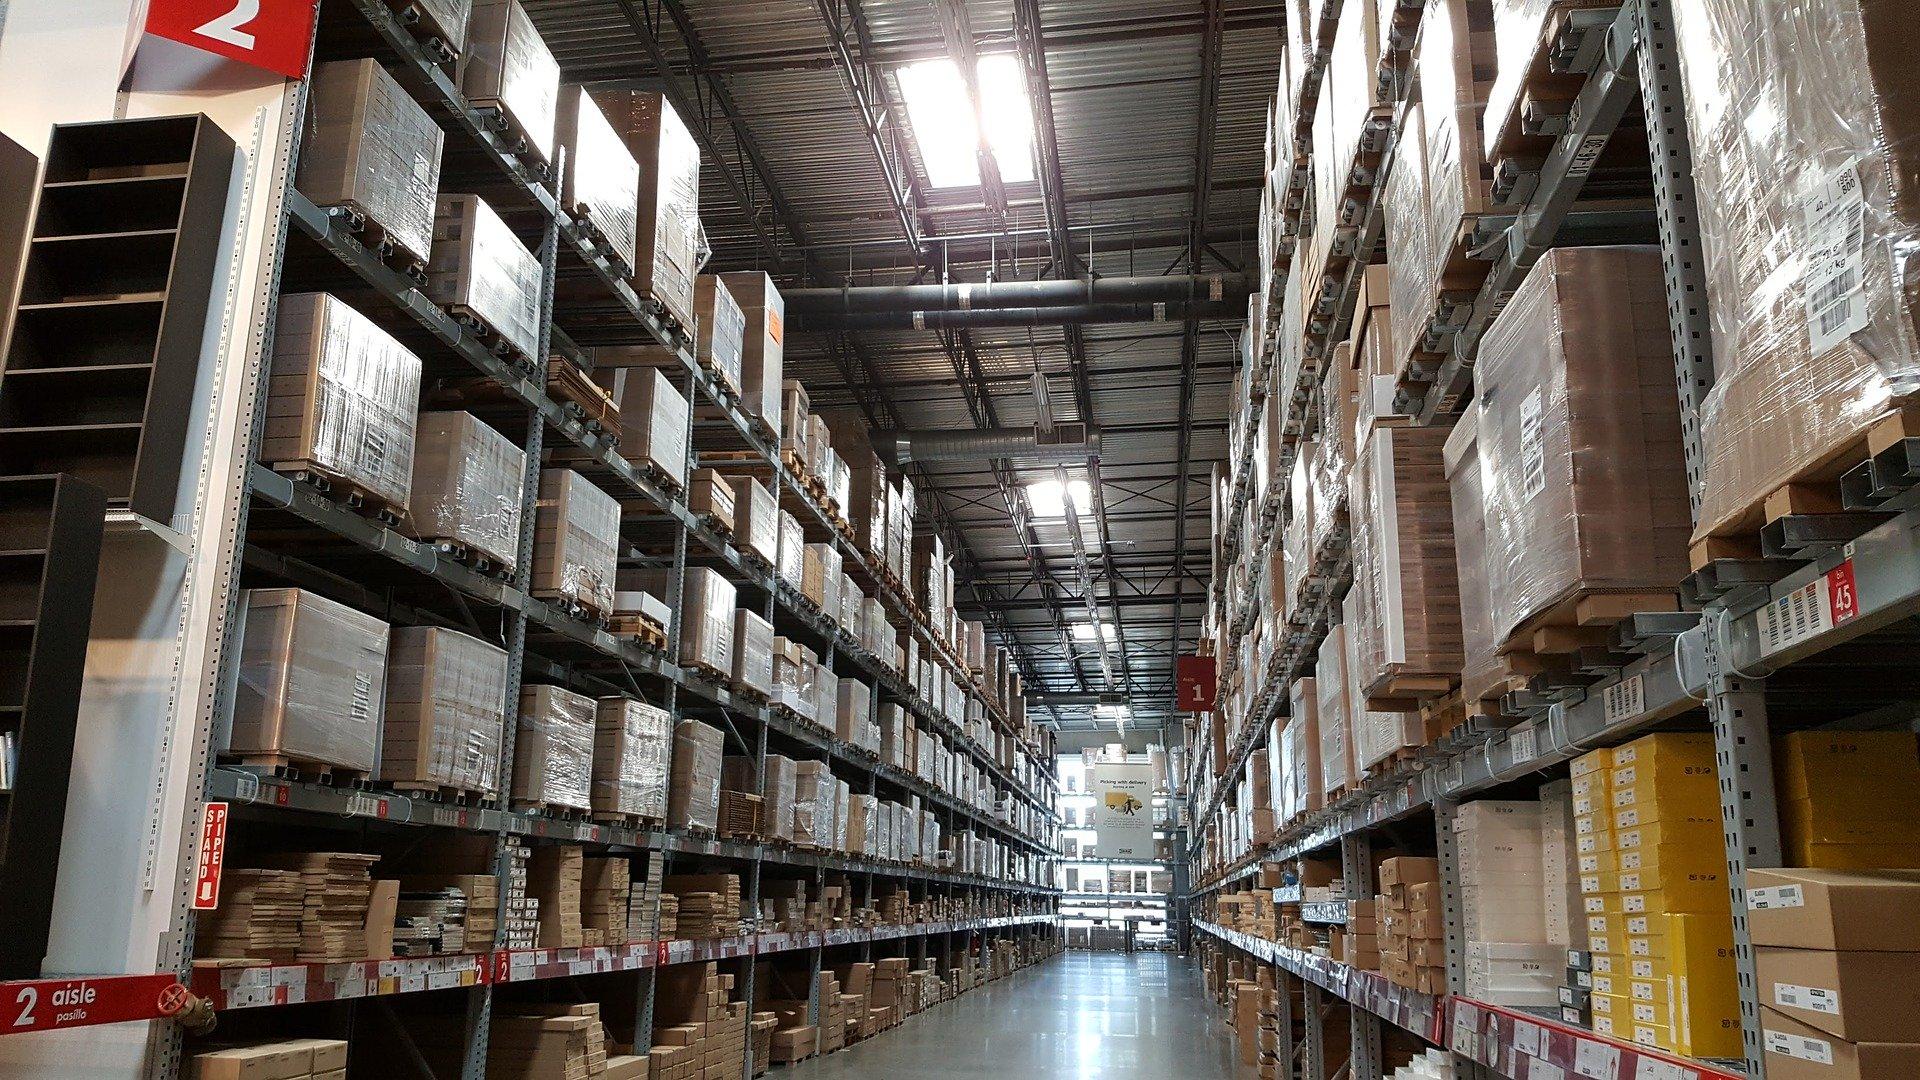 Warehouse ikea 2714998 1920